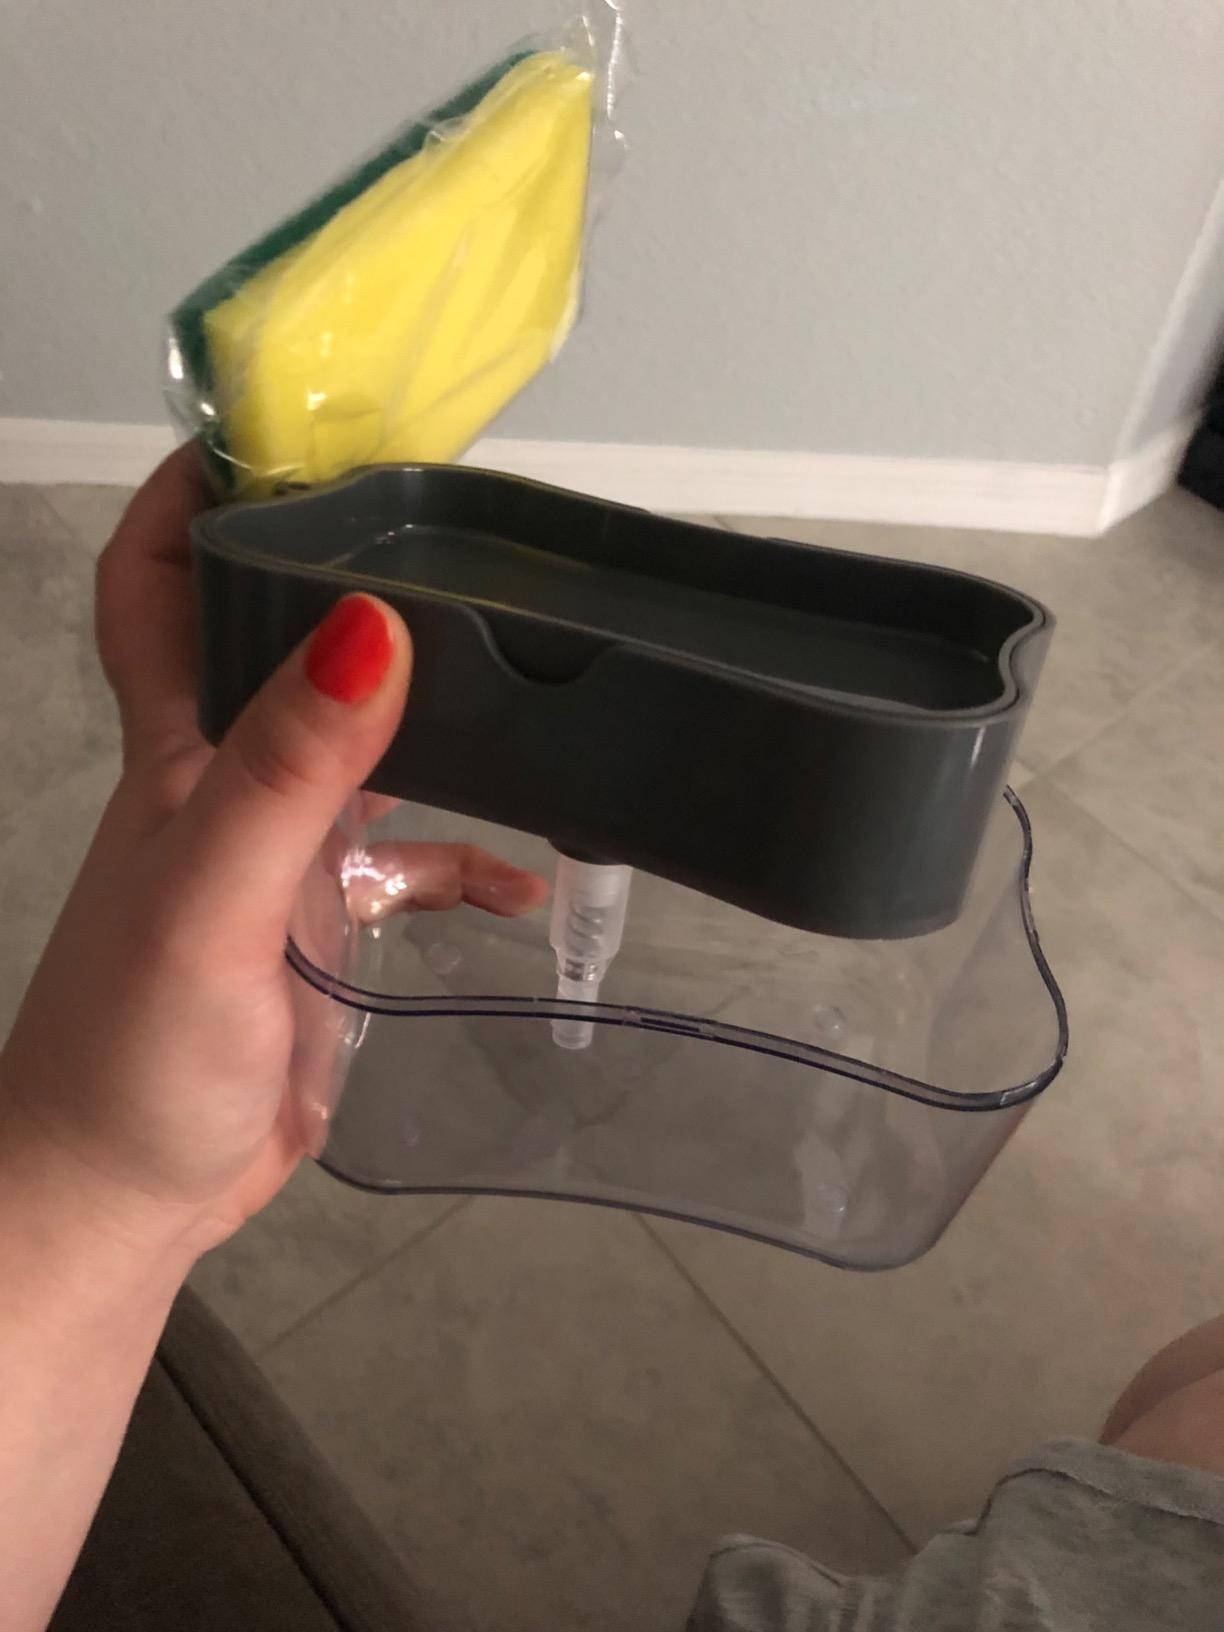 2-in-1 Soap Dispenser Sponge Caddy